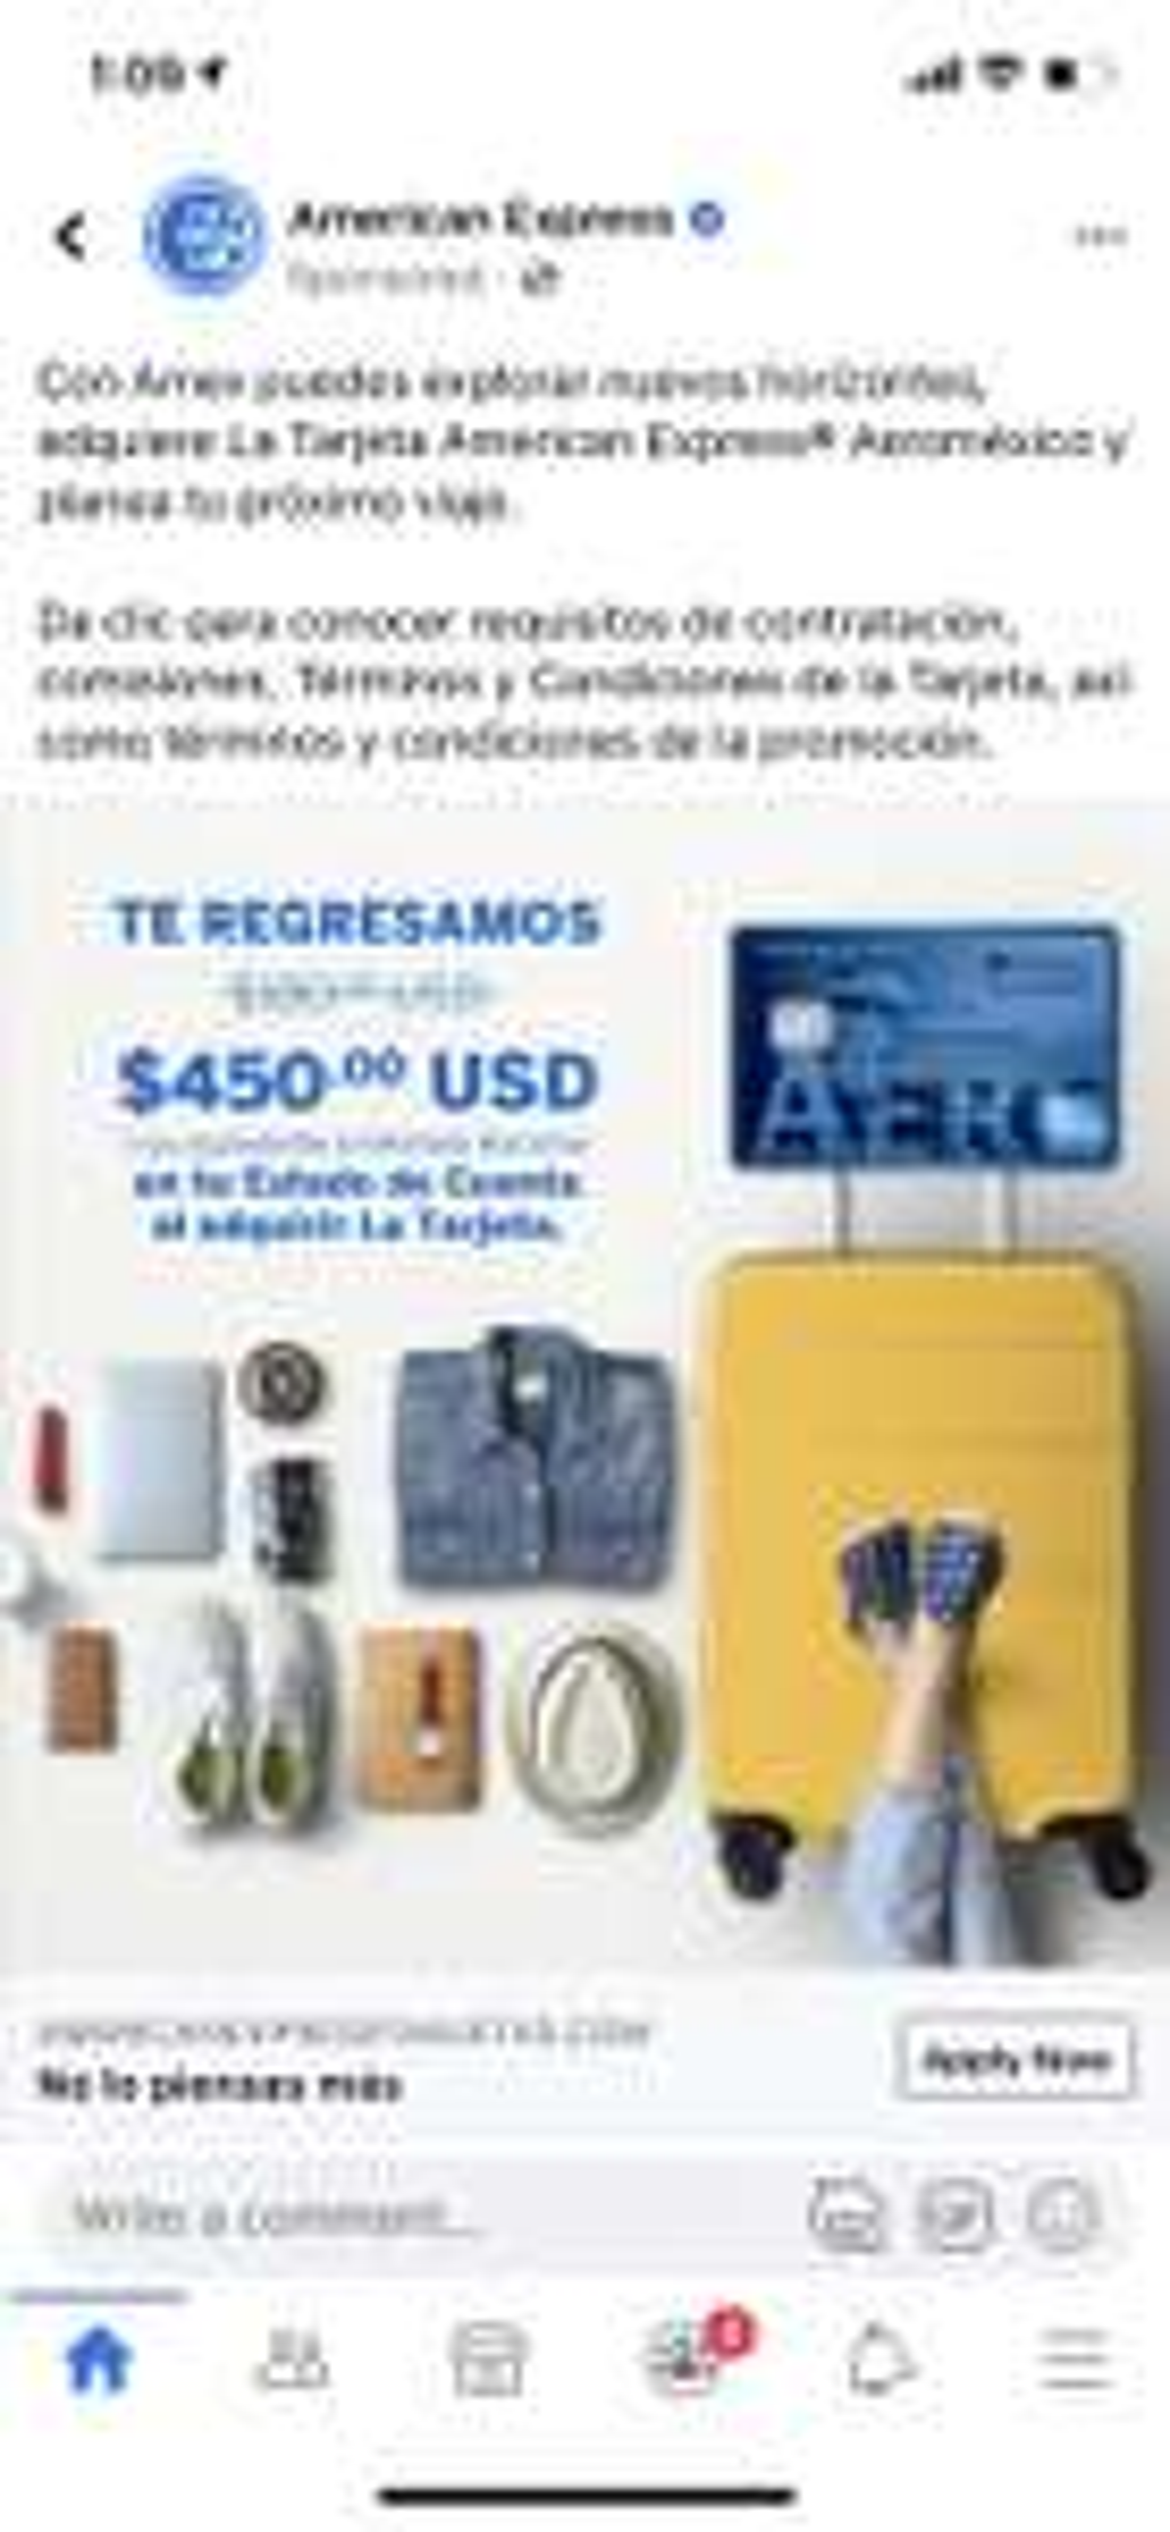 American Express: Te devuelven 450.00 USD al adquirir AMEX Aeromexico